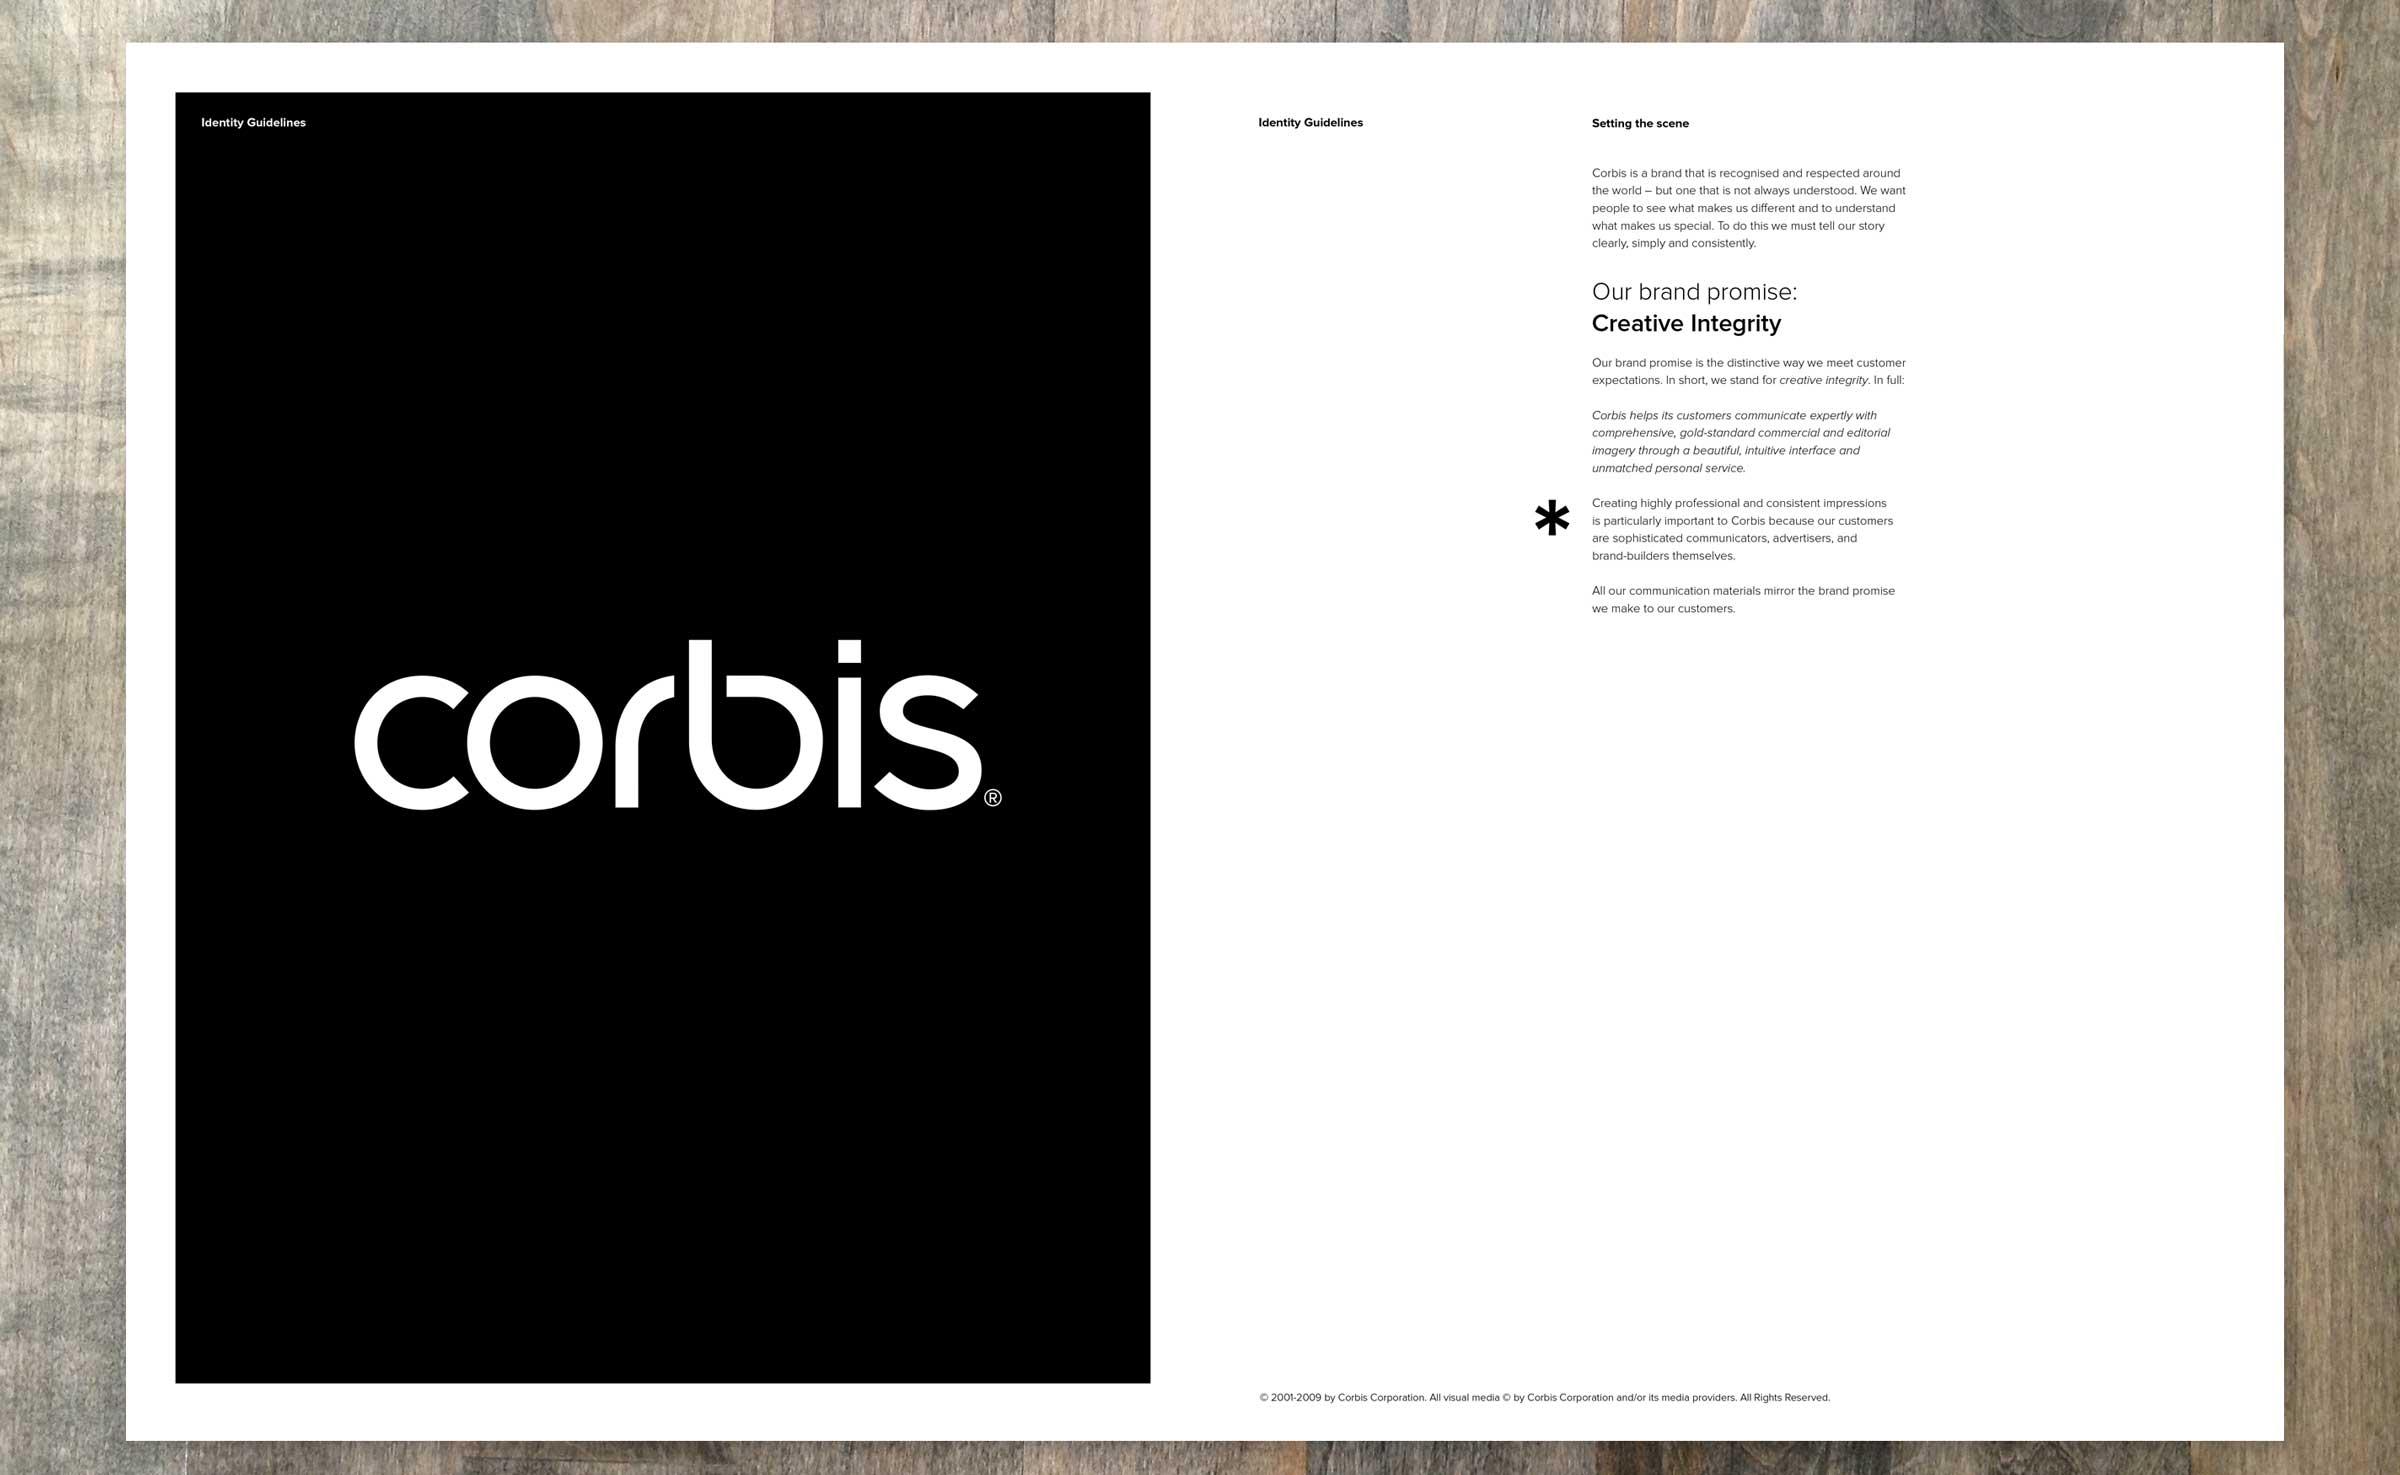 corbis_logo1.jpg